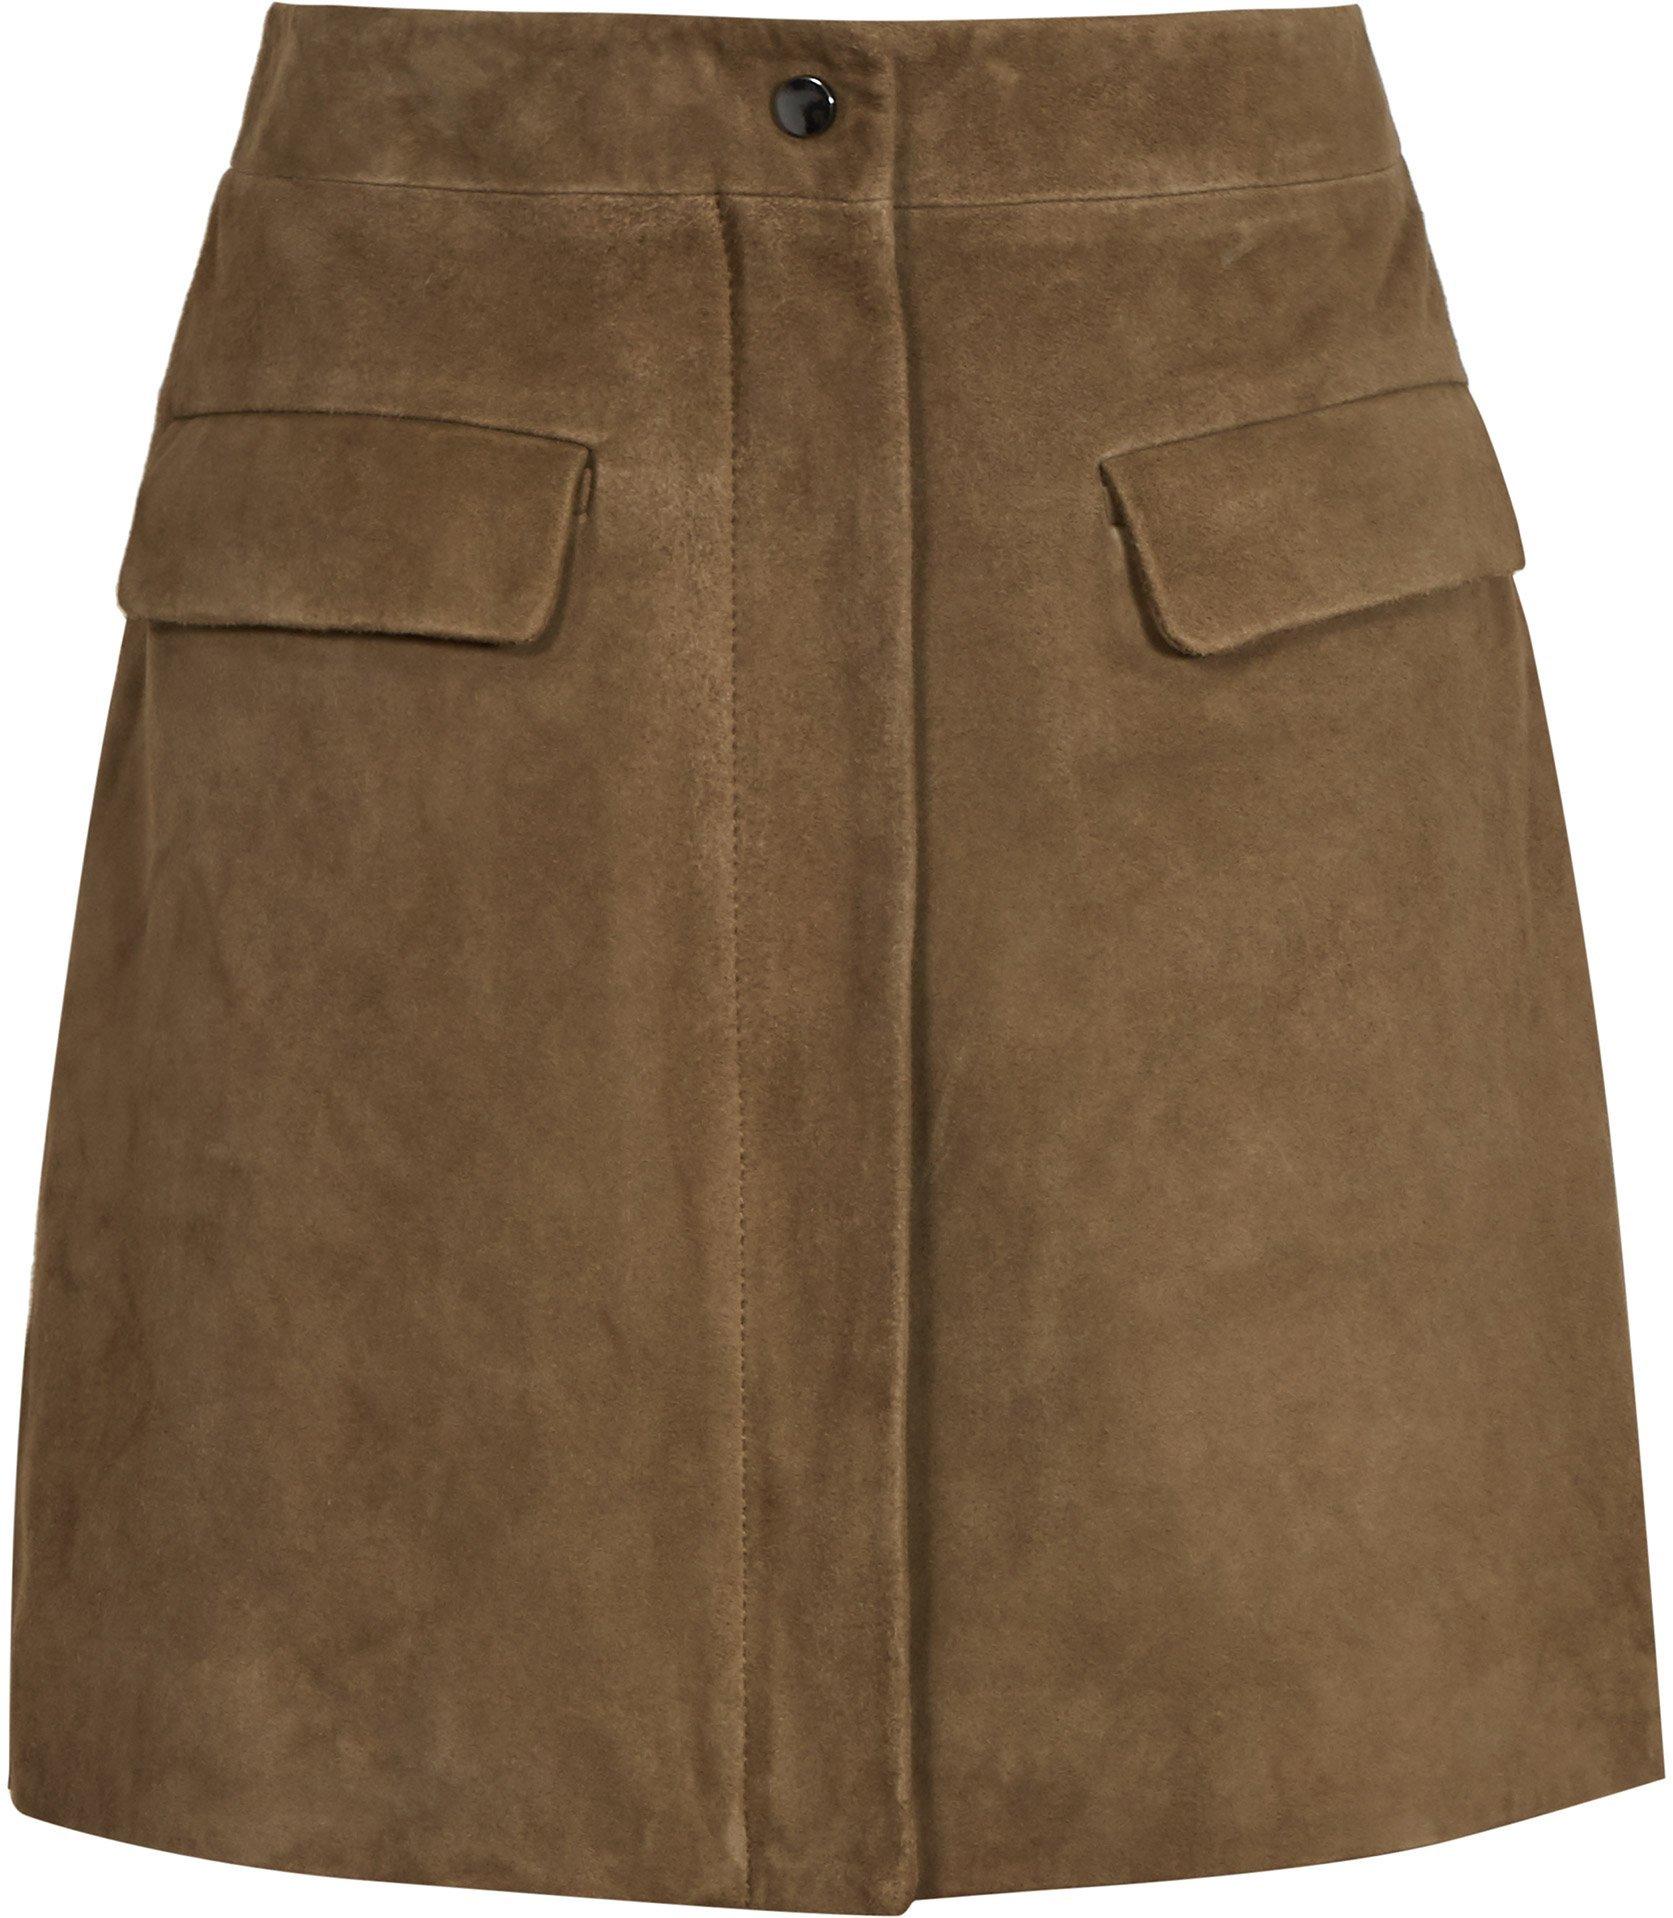 Marina Khaki Suede Skirt, Dhs1,150.